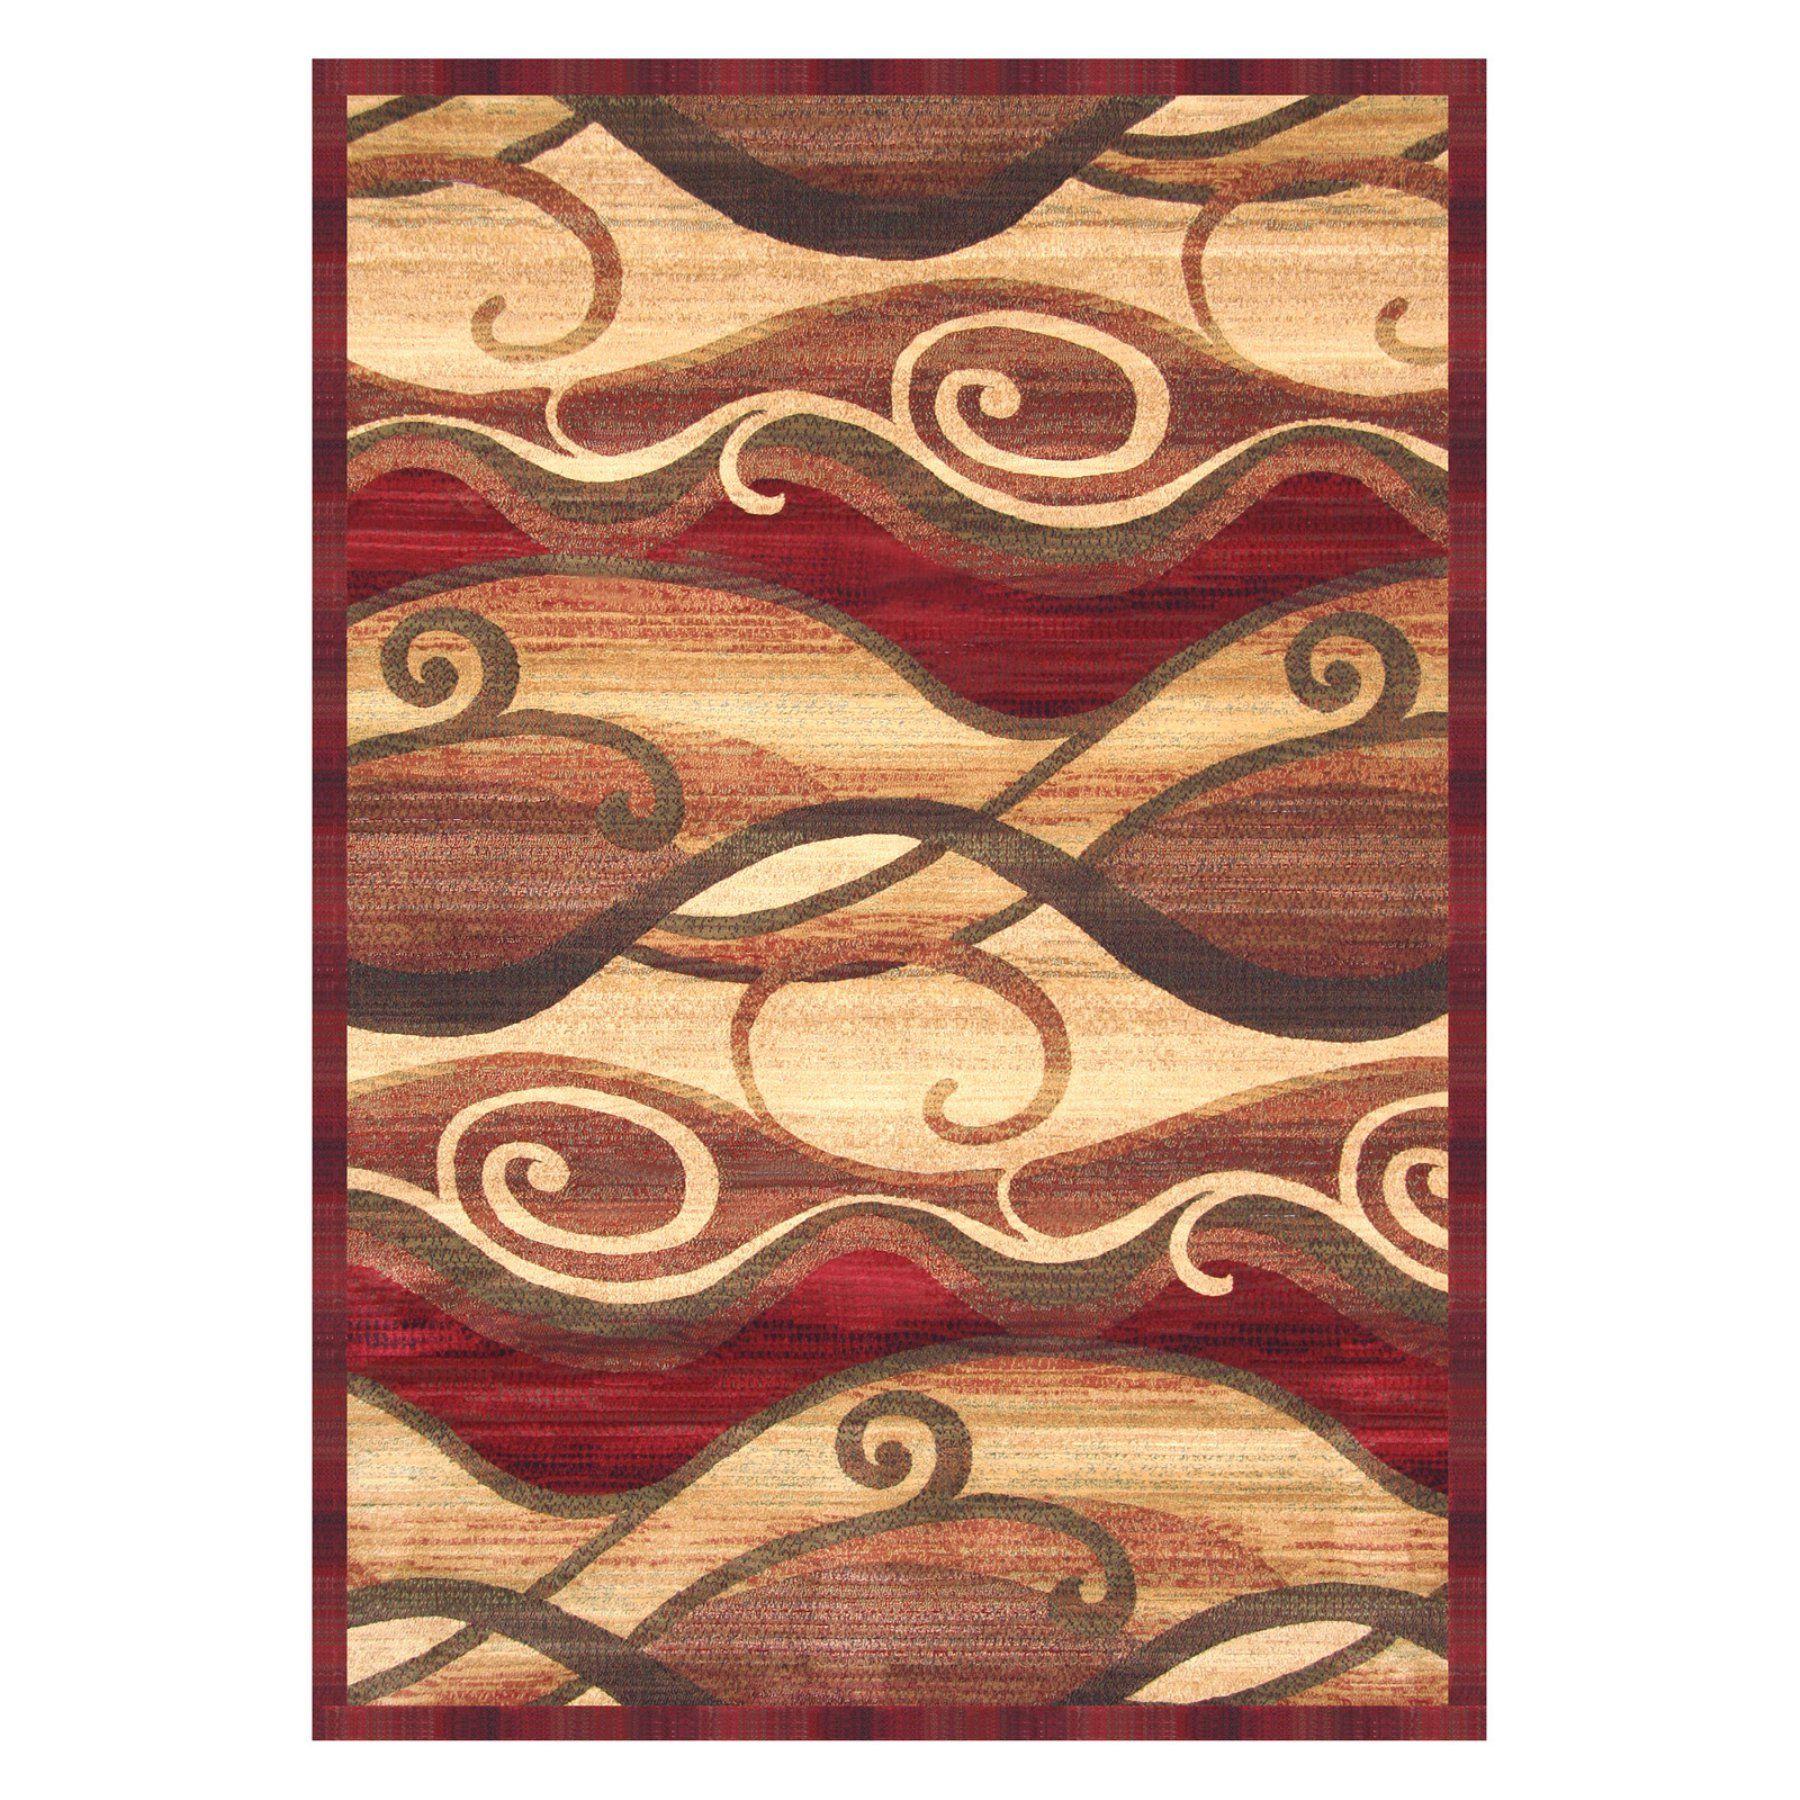 Adeline living foundations wendelle indoor area rug